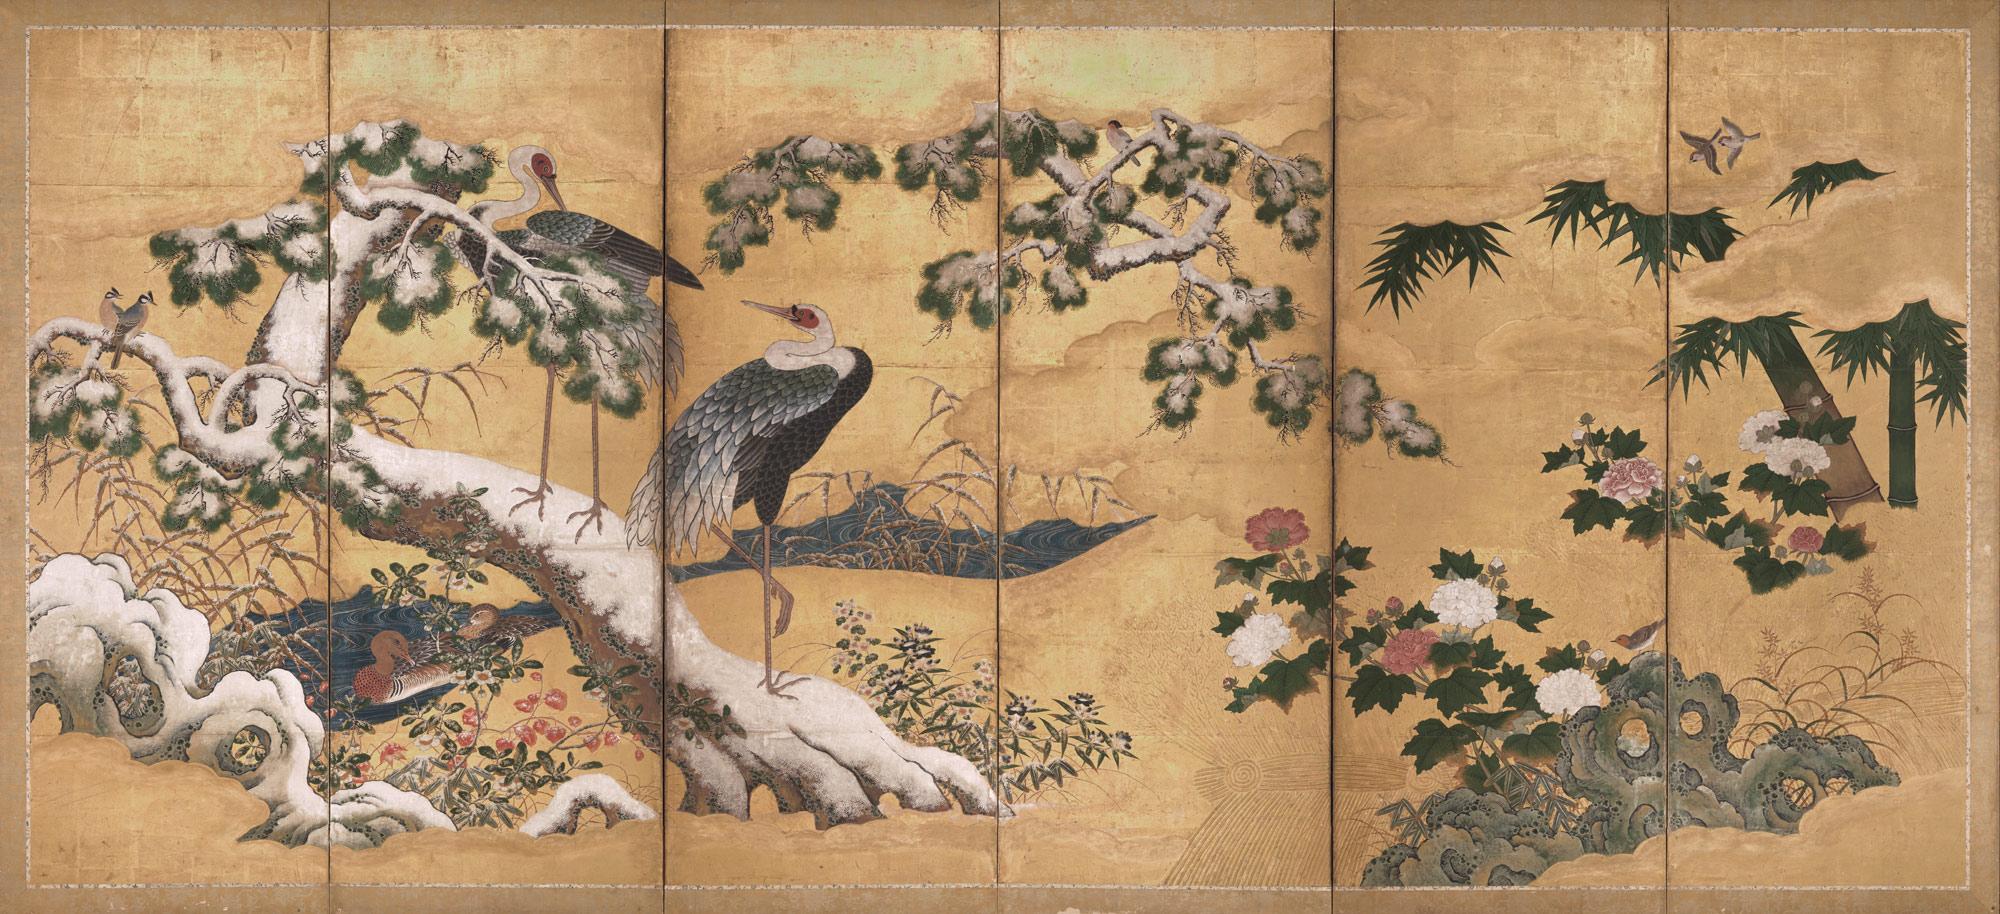 Places And Spaces Yoshiaki Shimizu On Copying